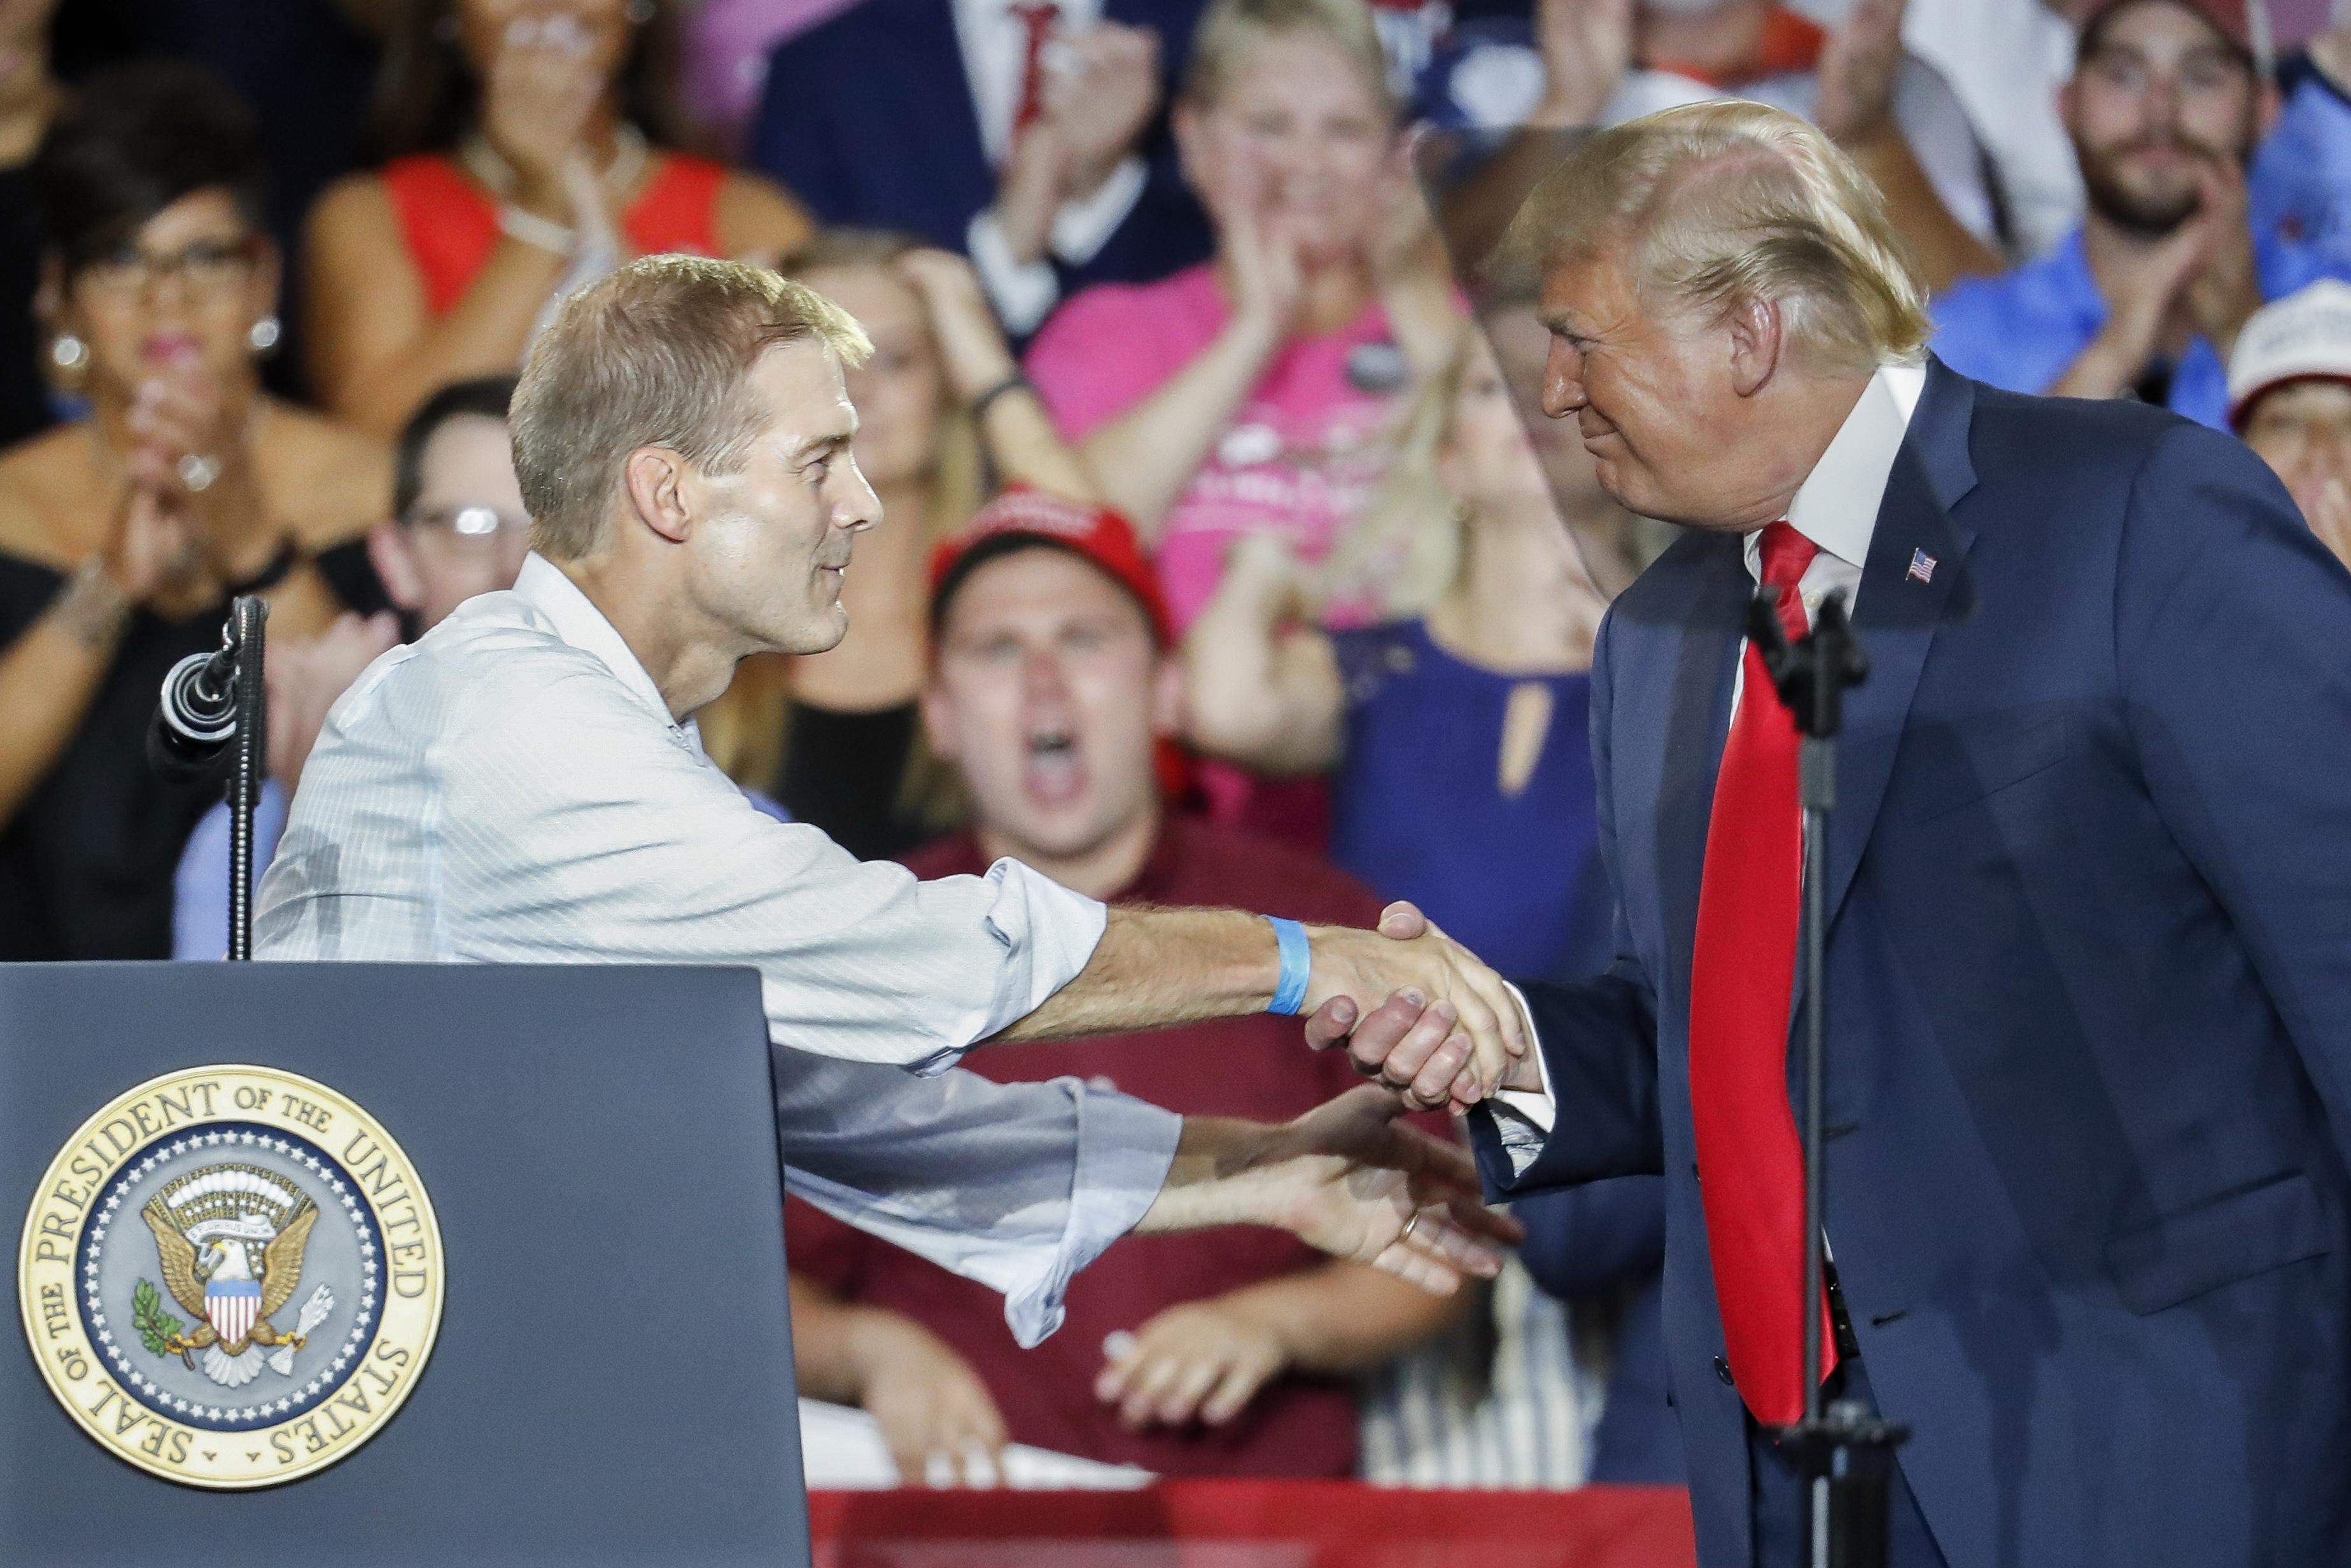 'Impeach Trump' preceded even Trump's nomination